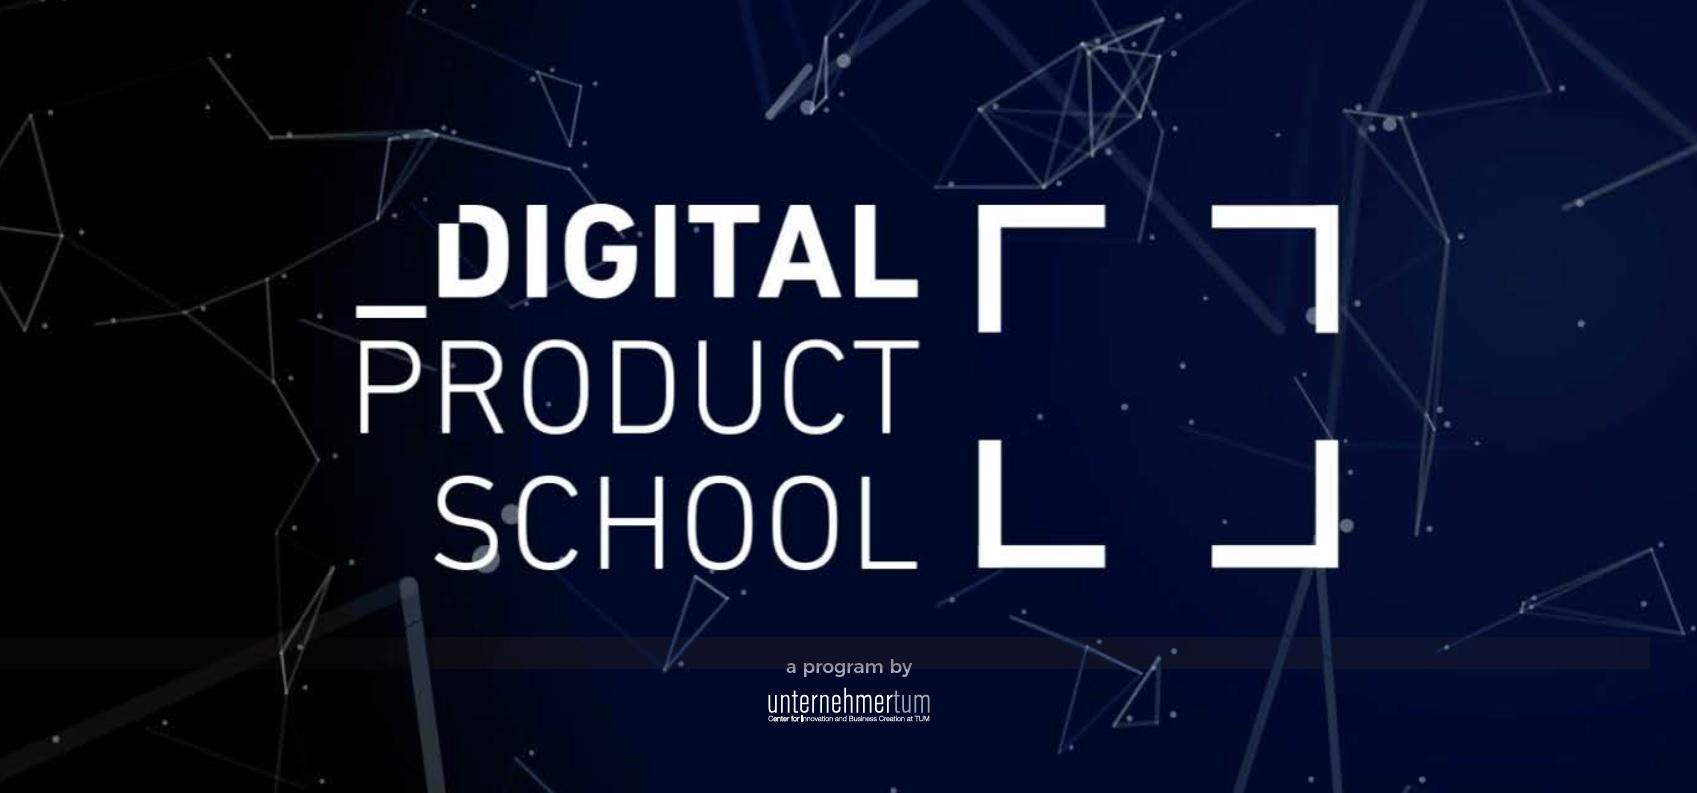 Digital Product School   Munich Startup